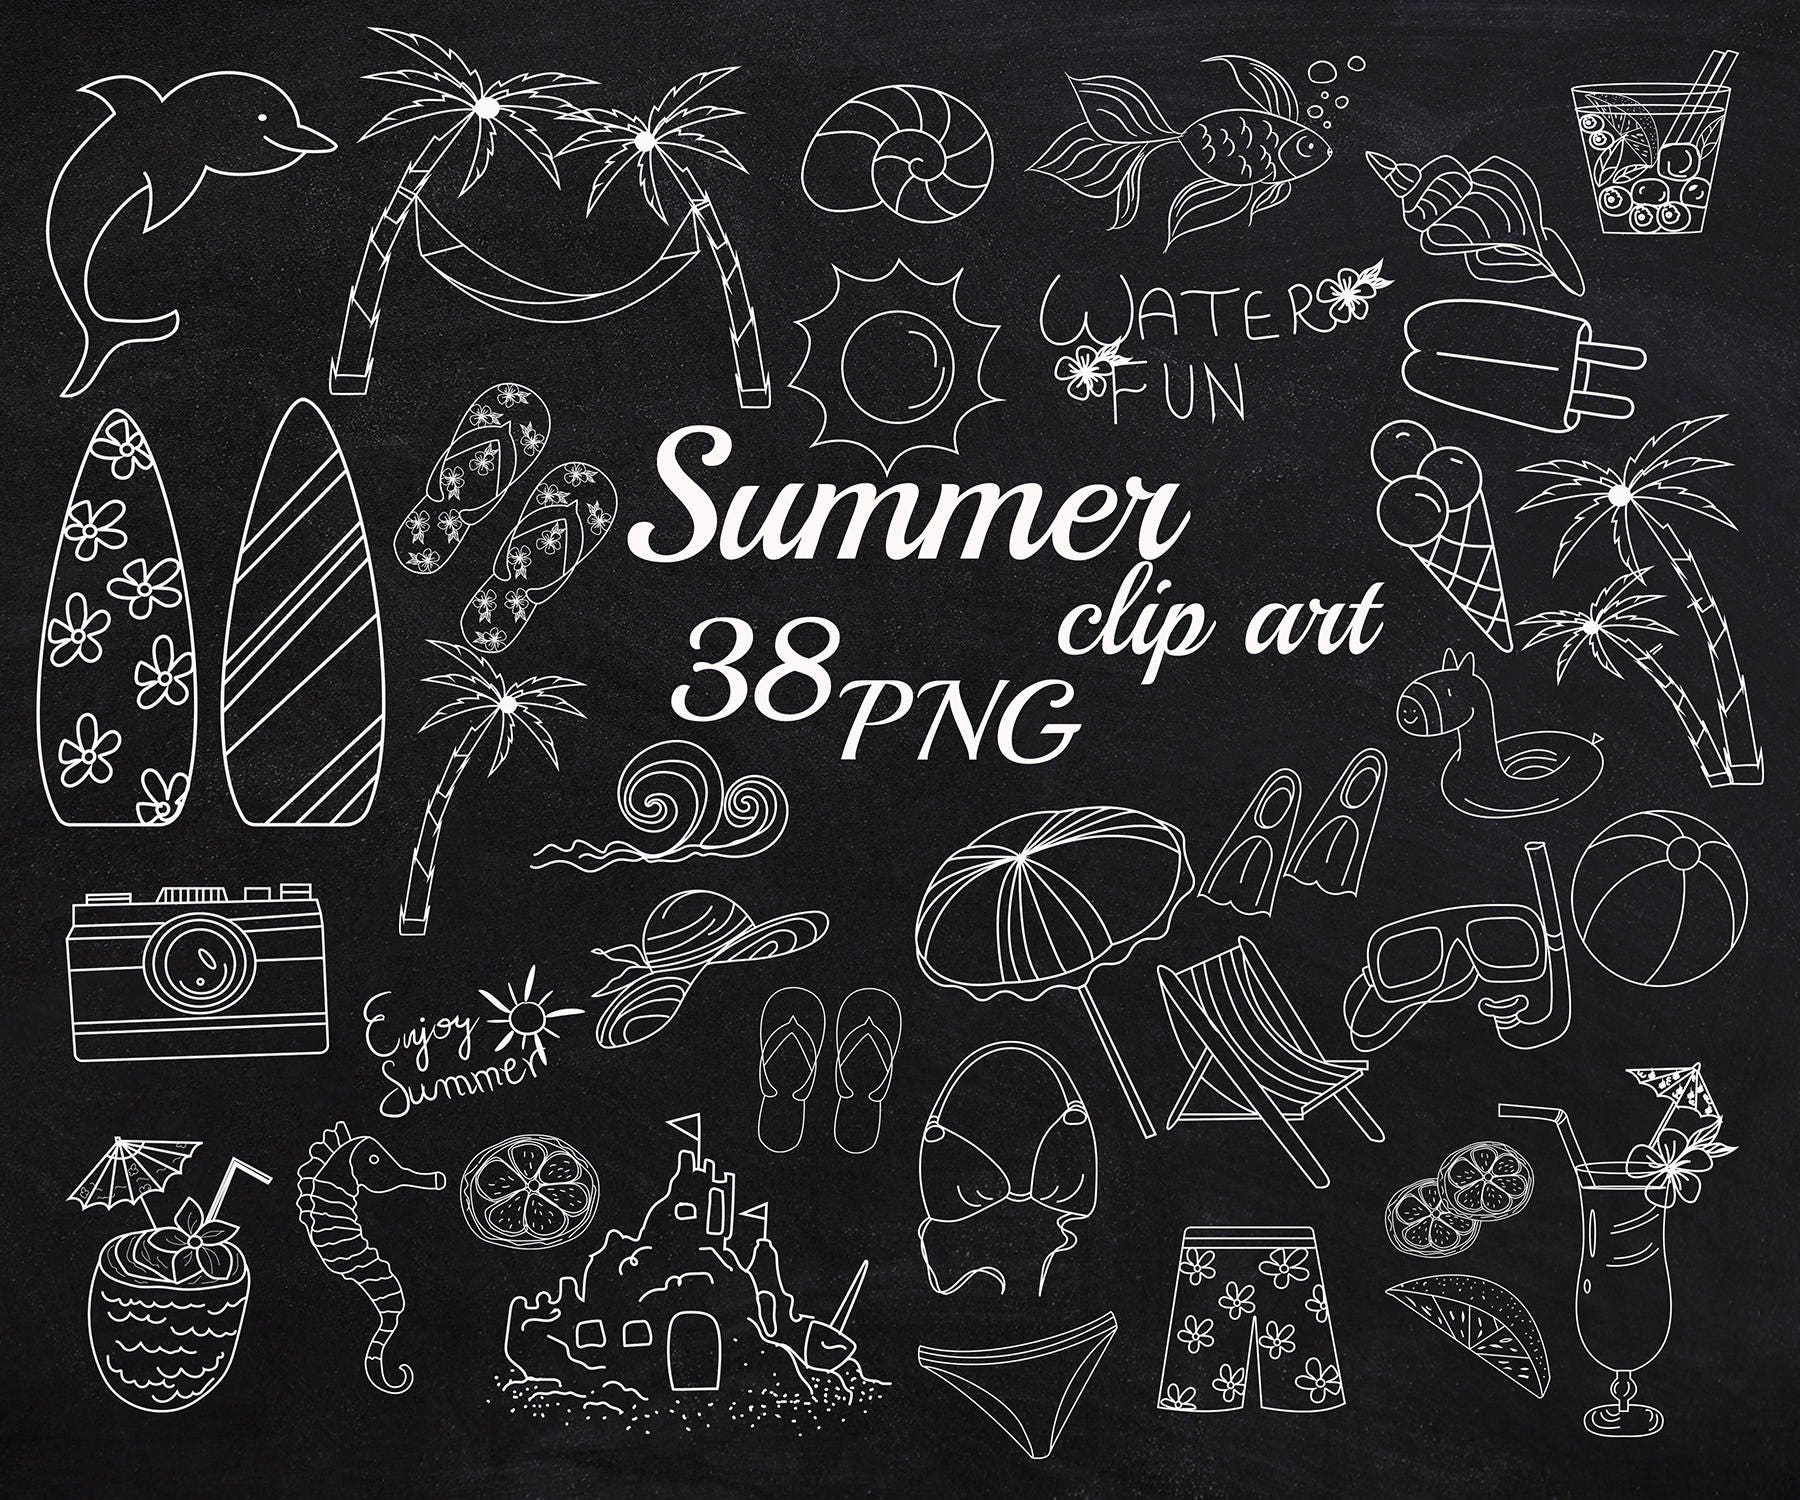 Tafel doodle Sommer Clipart: Sommer ClipArt Sommer